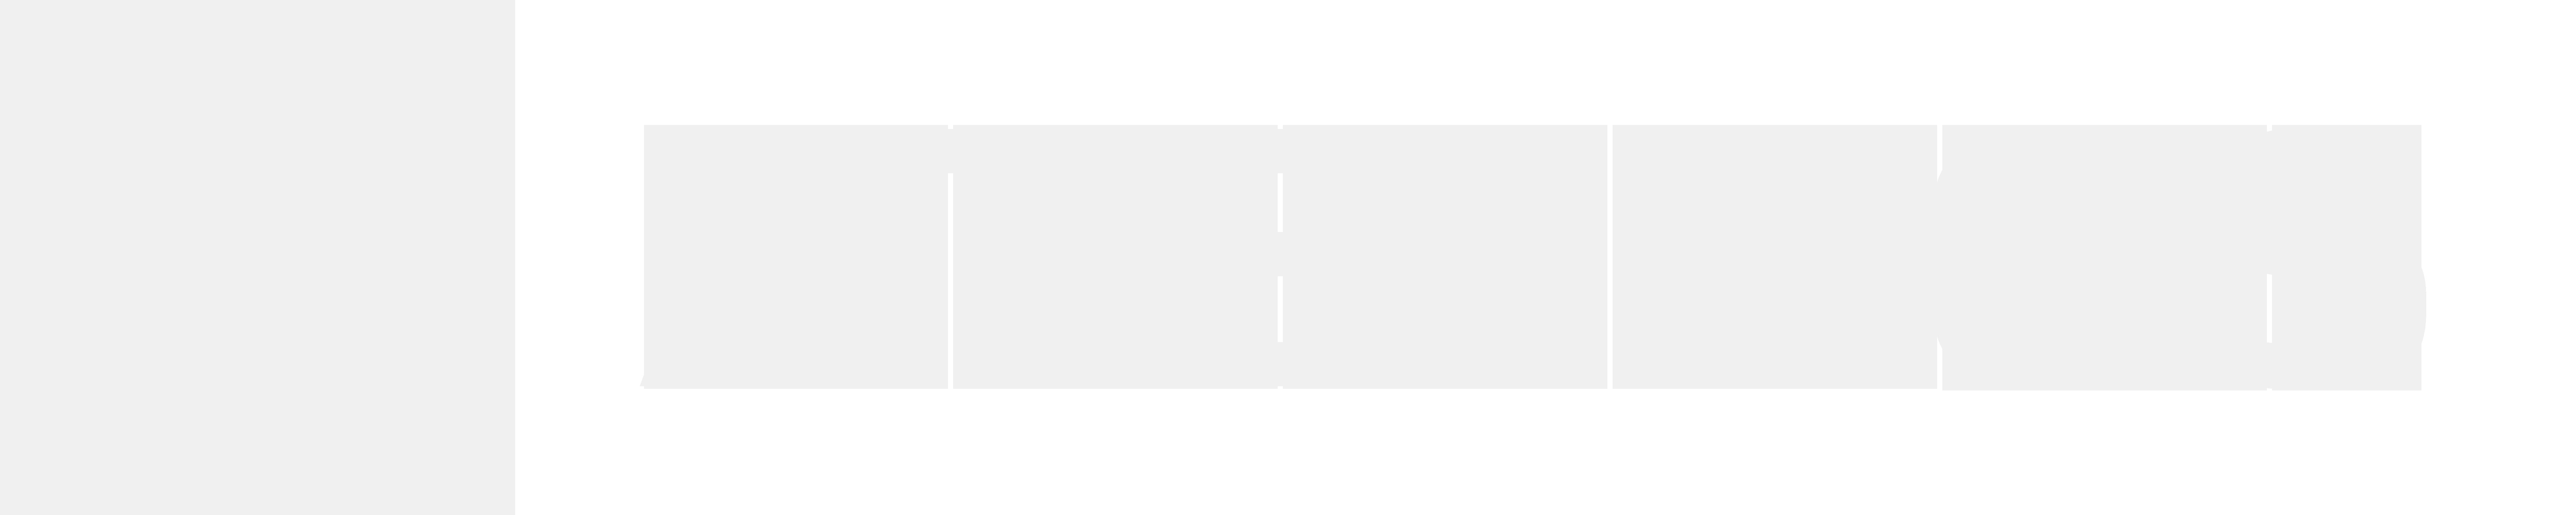 Install plugins – Aternos